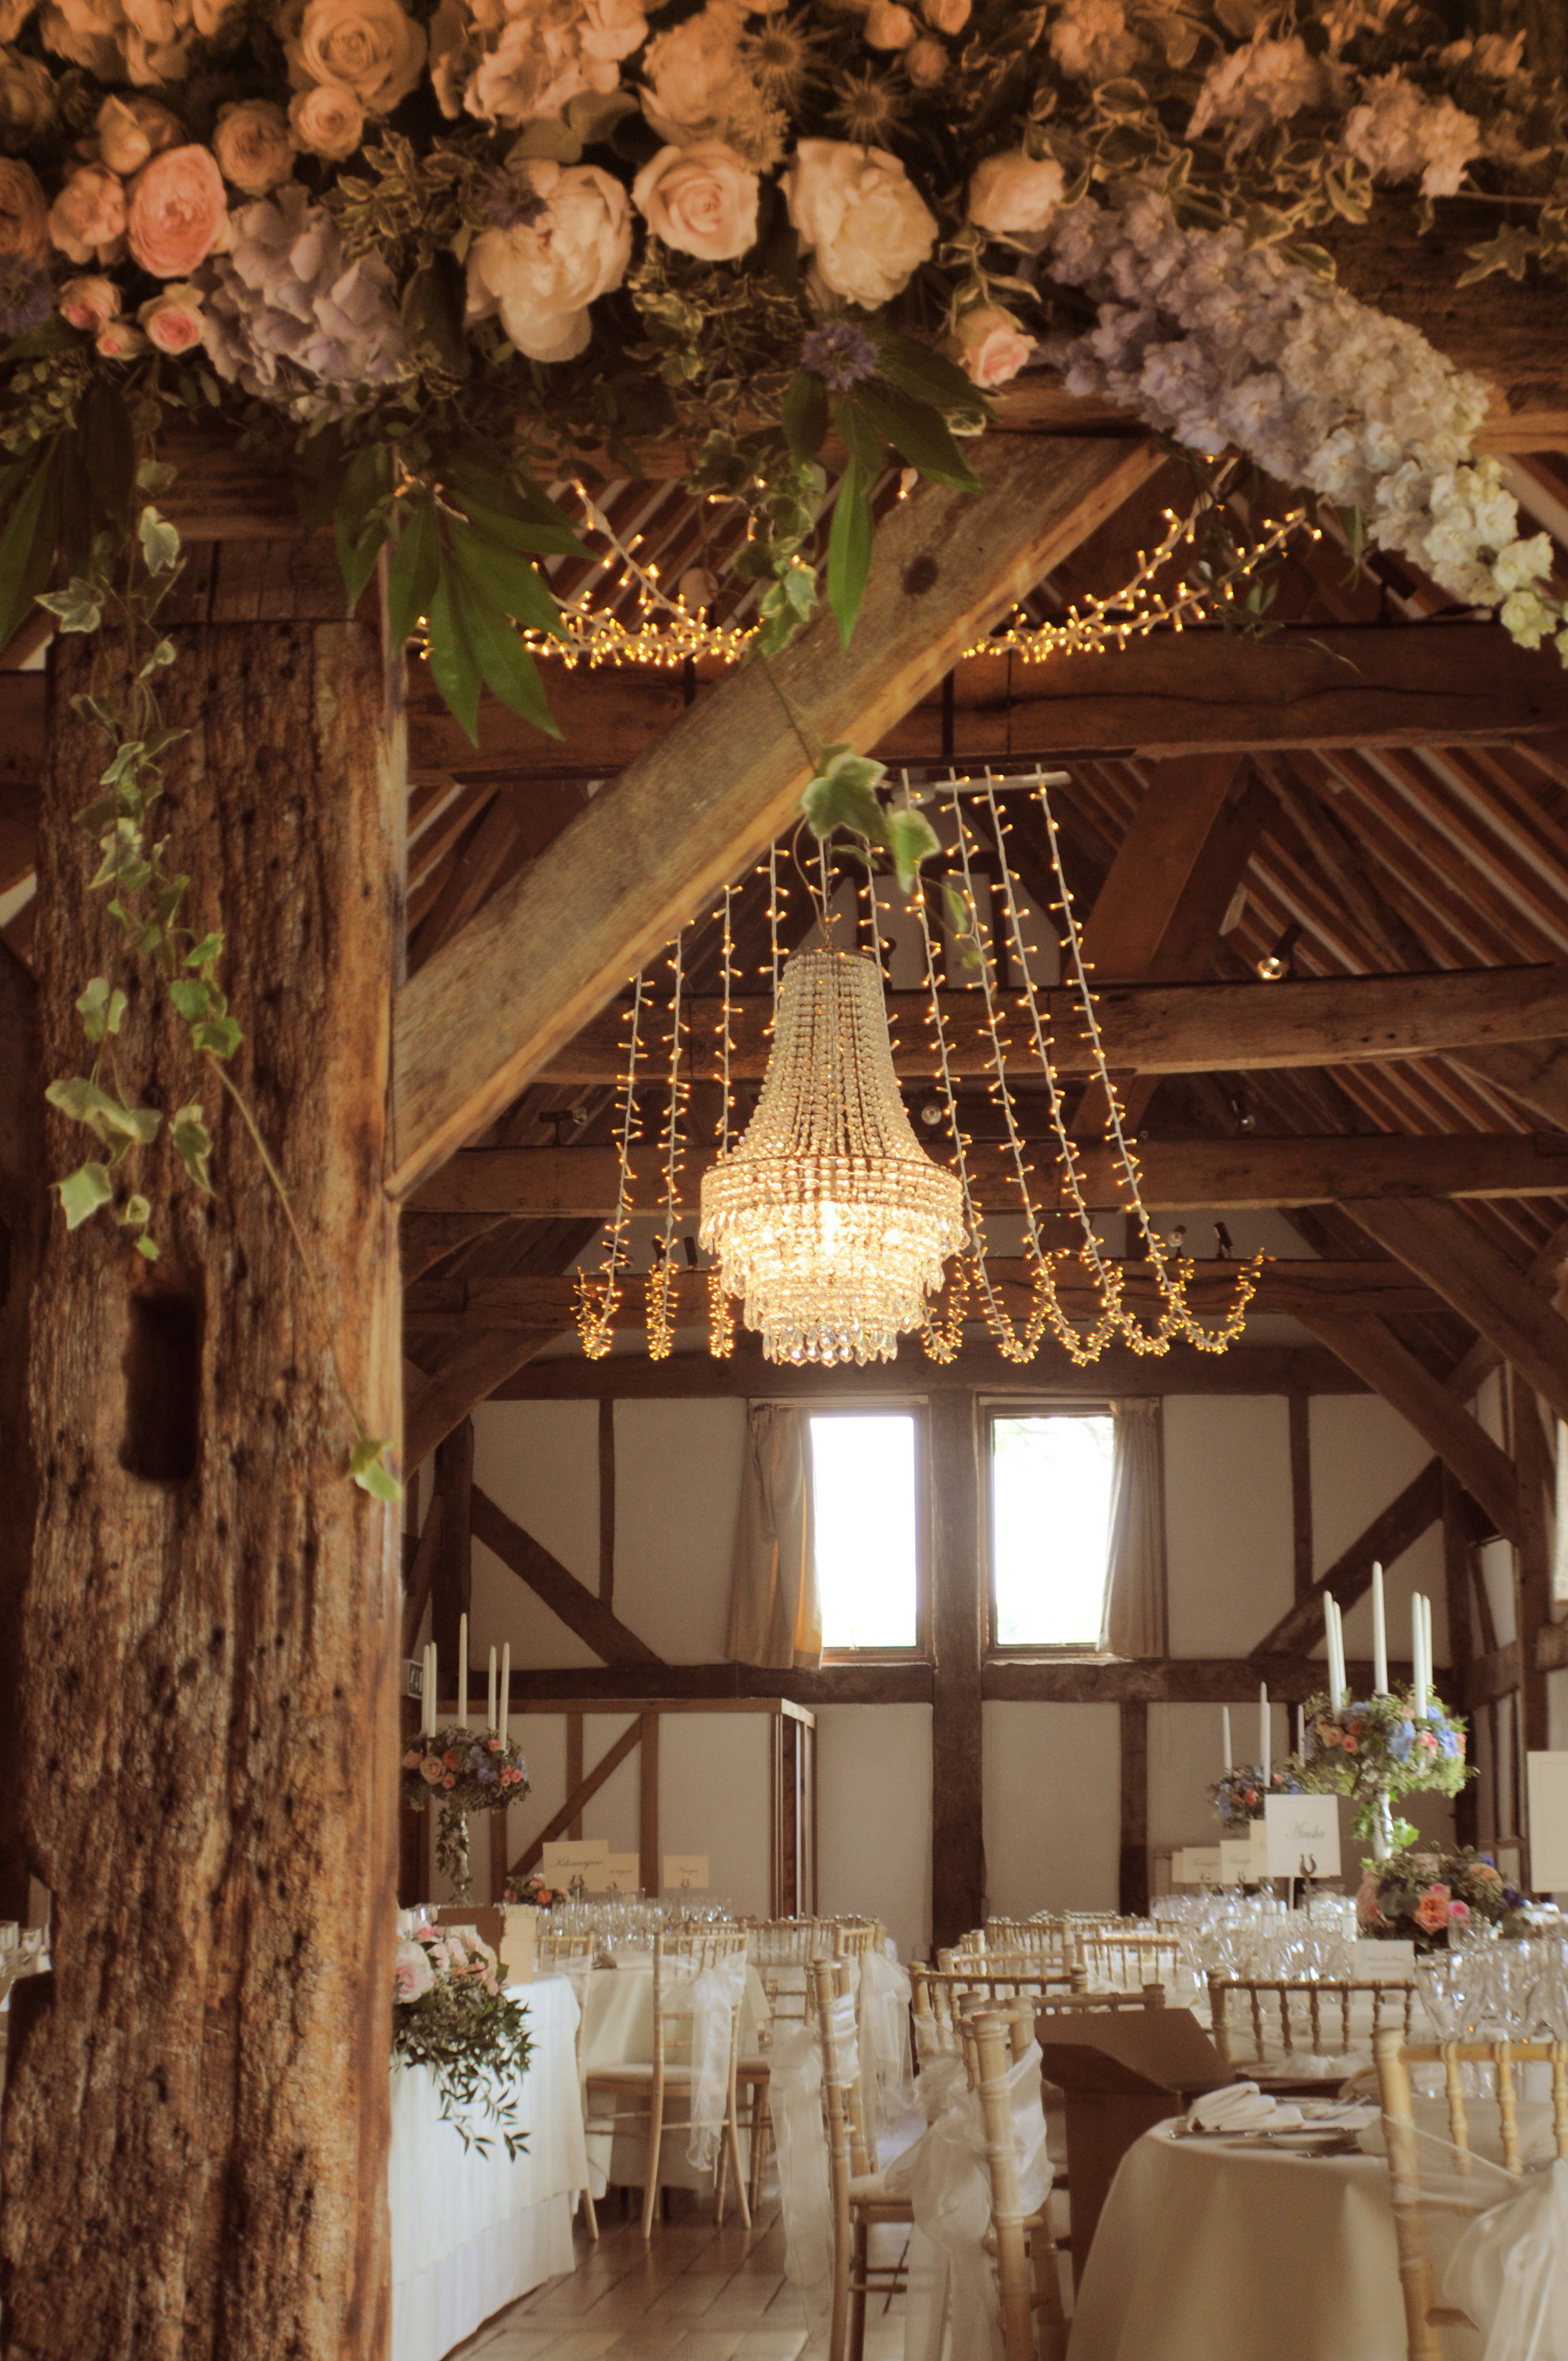 Fairy light wedding decoration ideas  Crystal wedding chandelier with a fairy light canopy at the